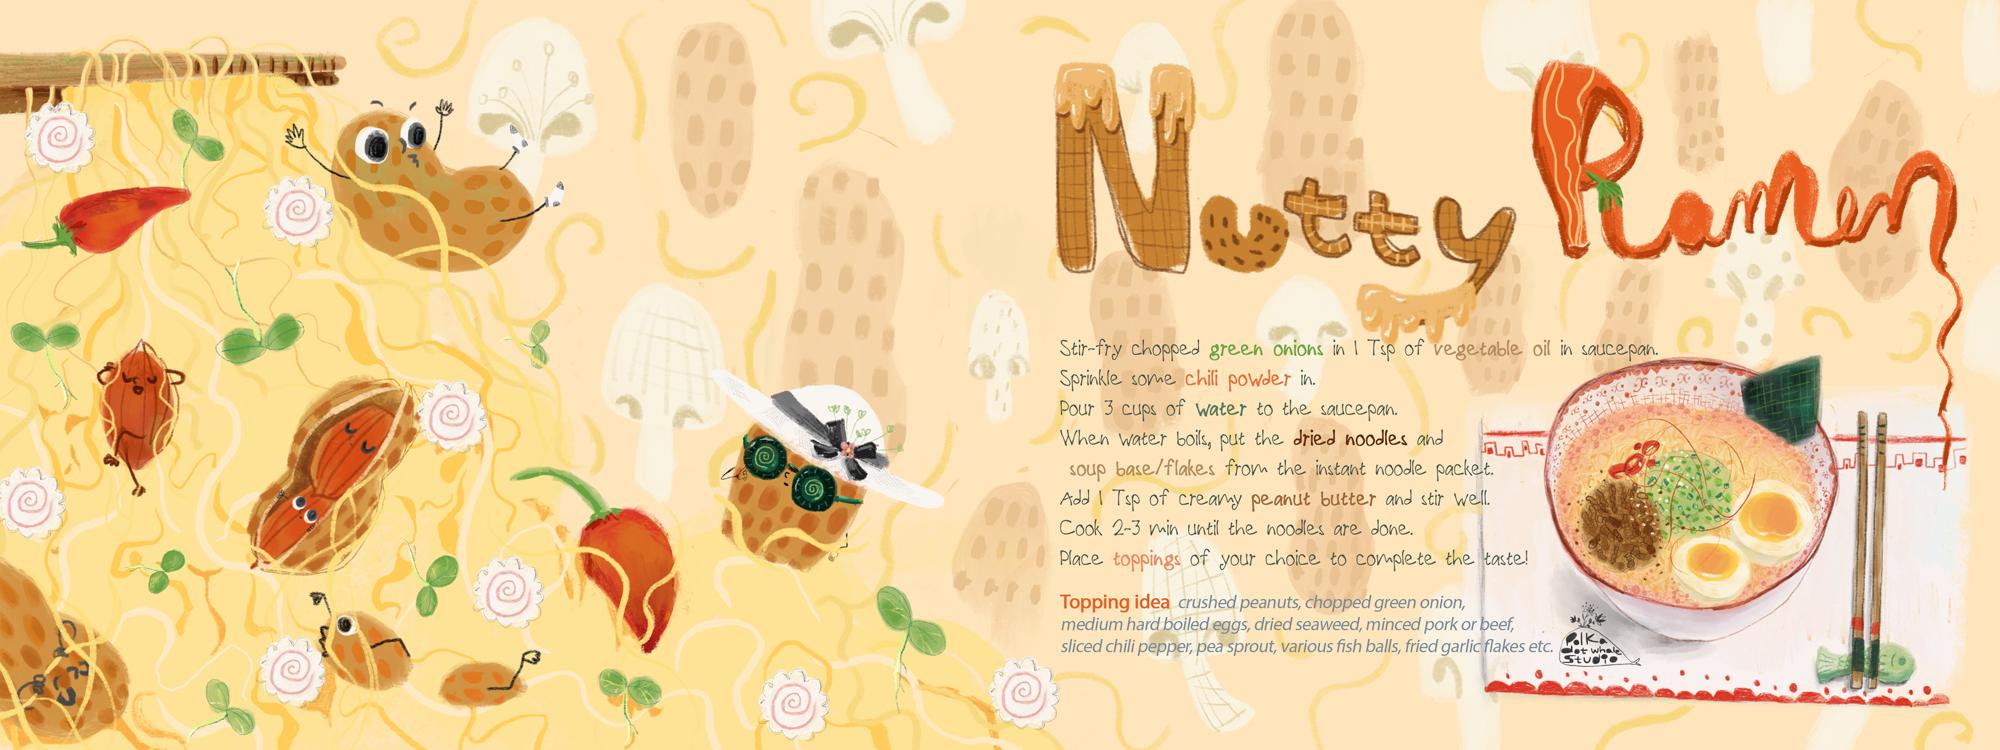 nutty_ramen_Youngsun_Kim_Web_medium.jpg